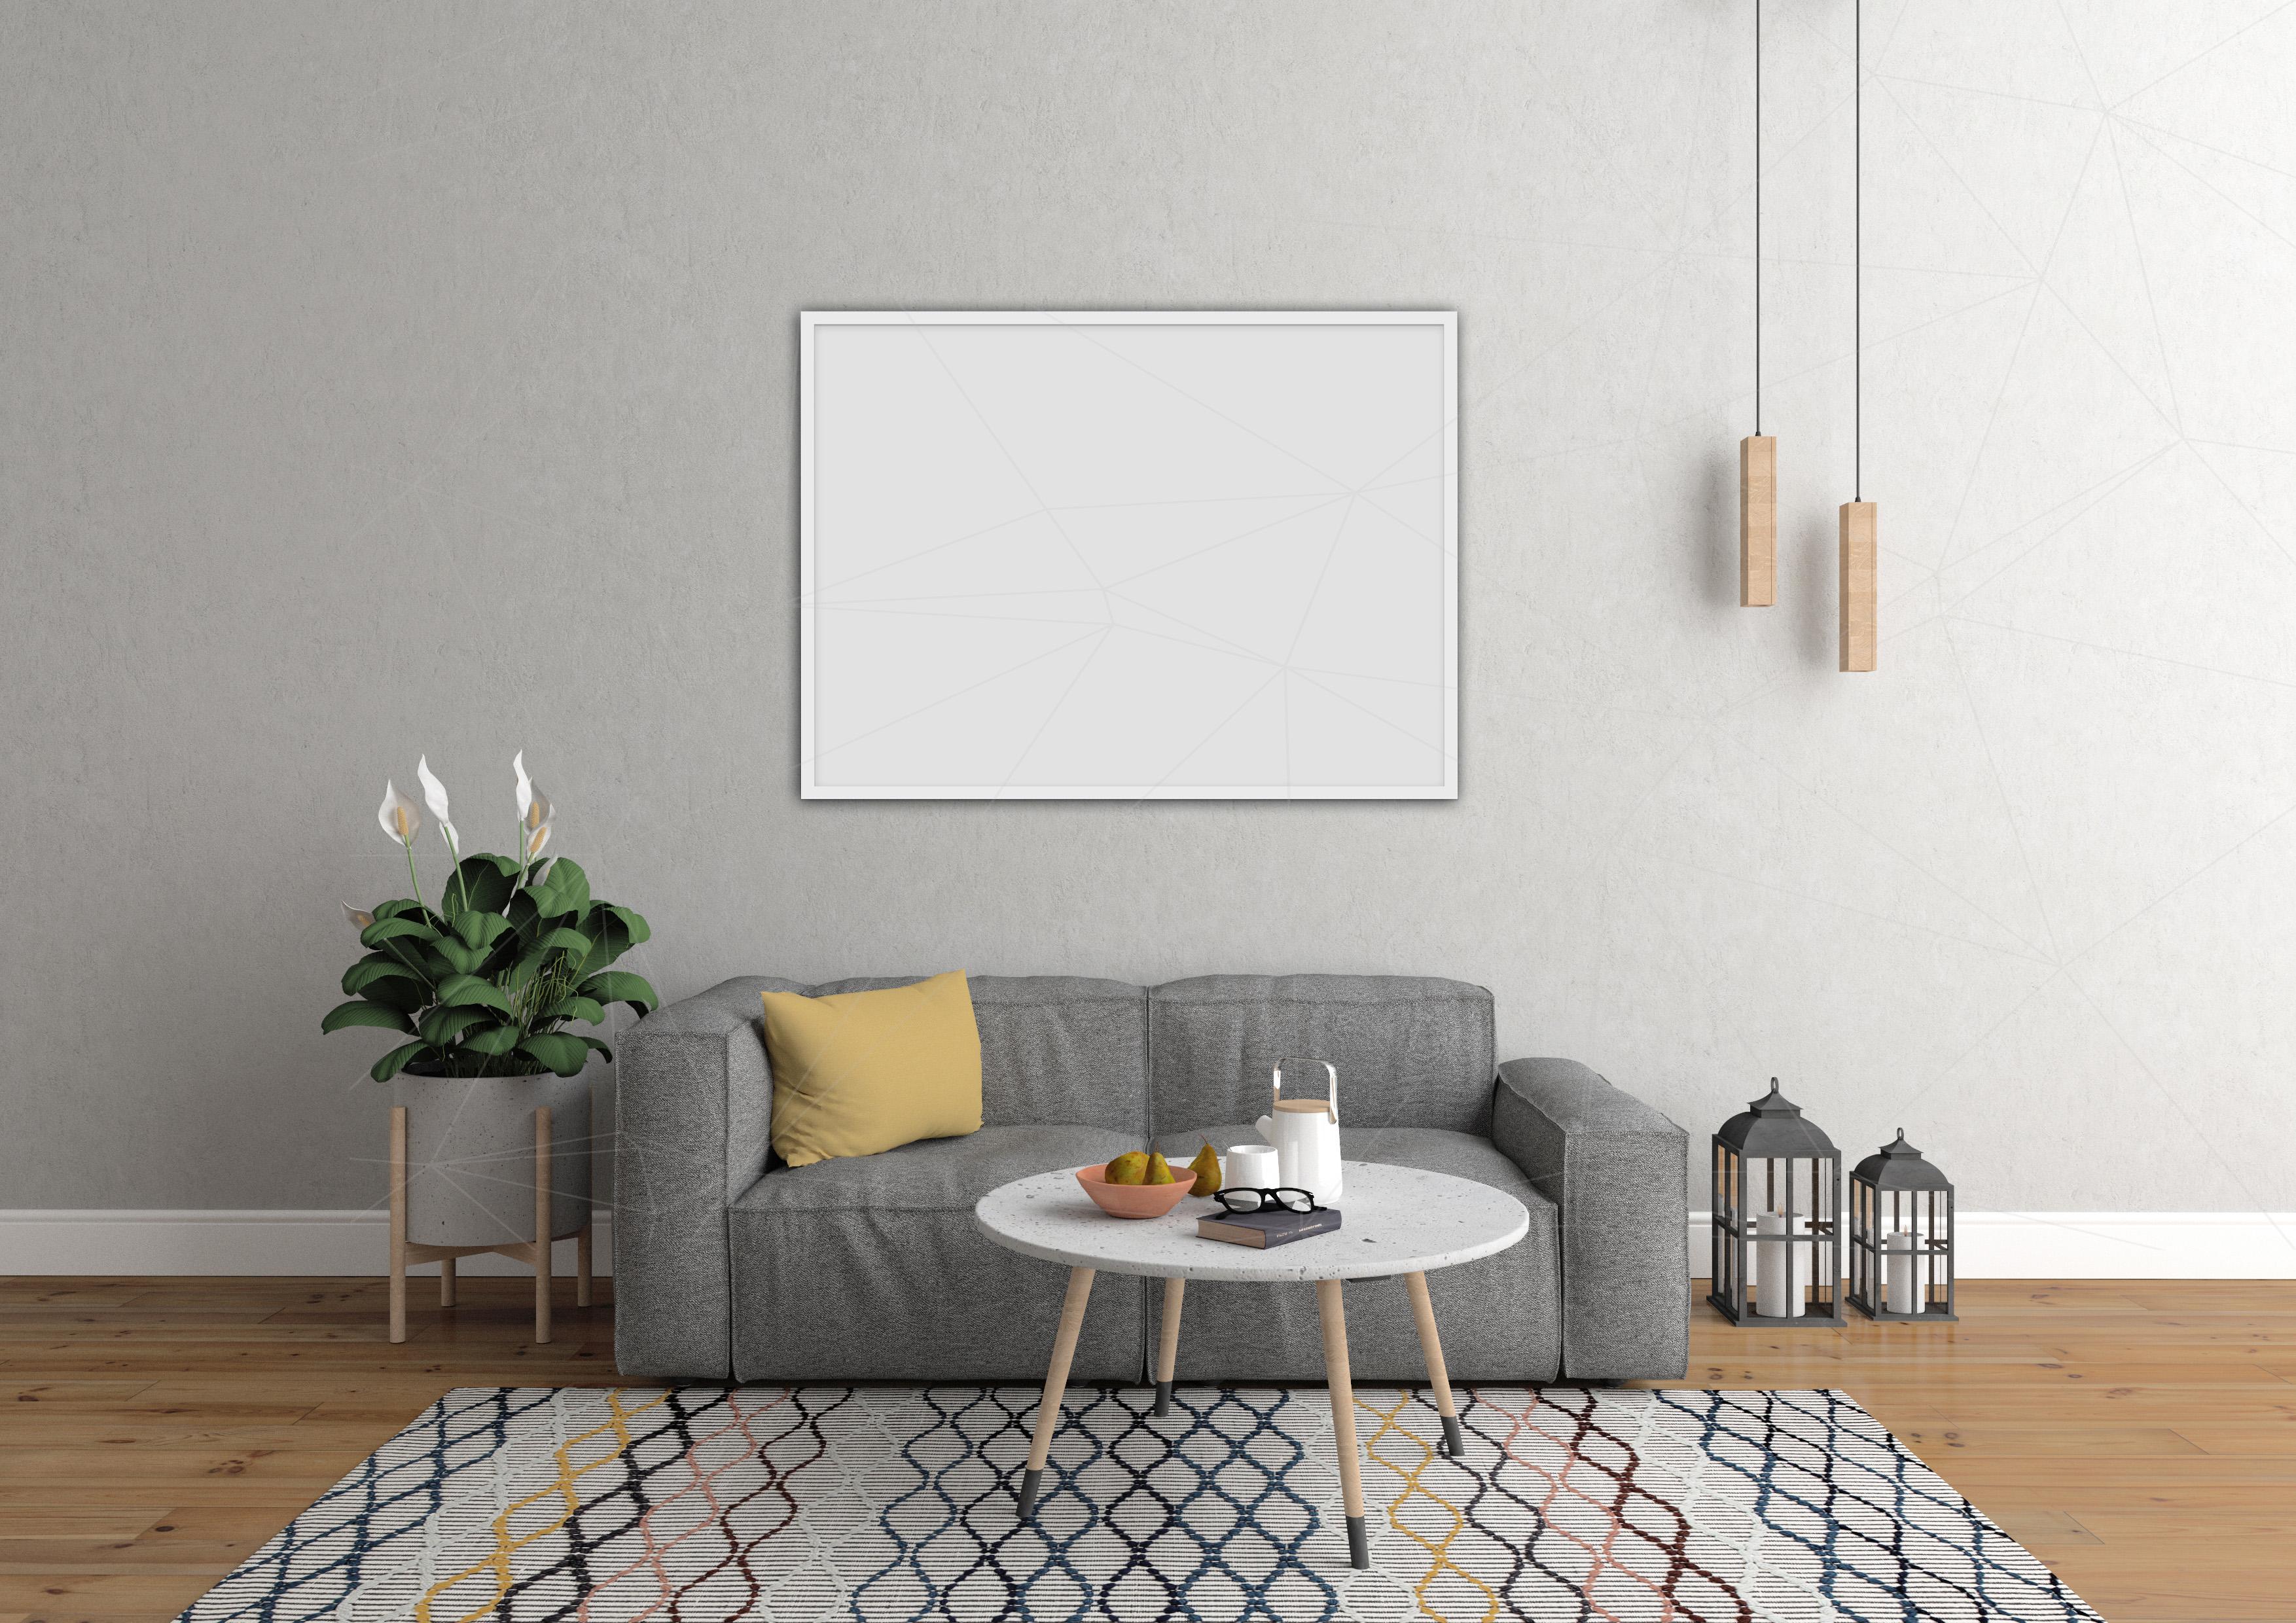 Interior mockup bundle - blank wall mock up example image 6